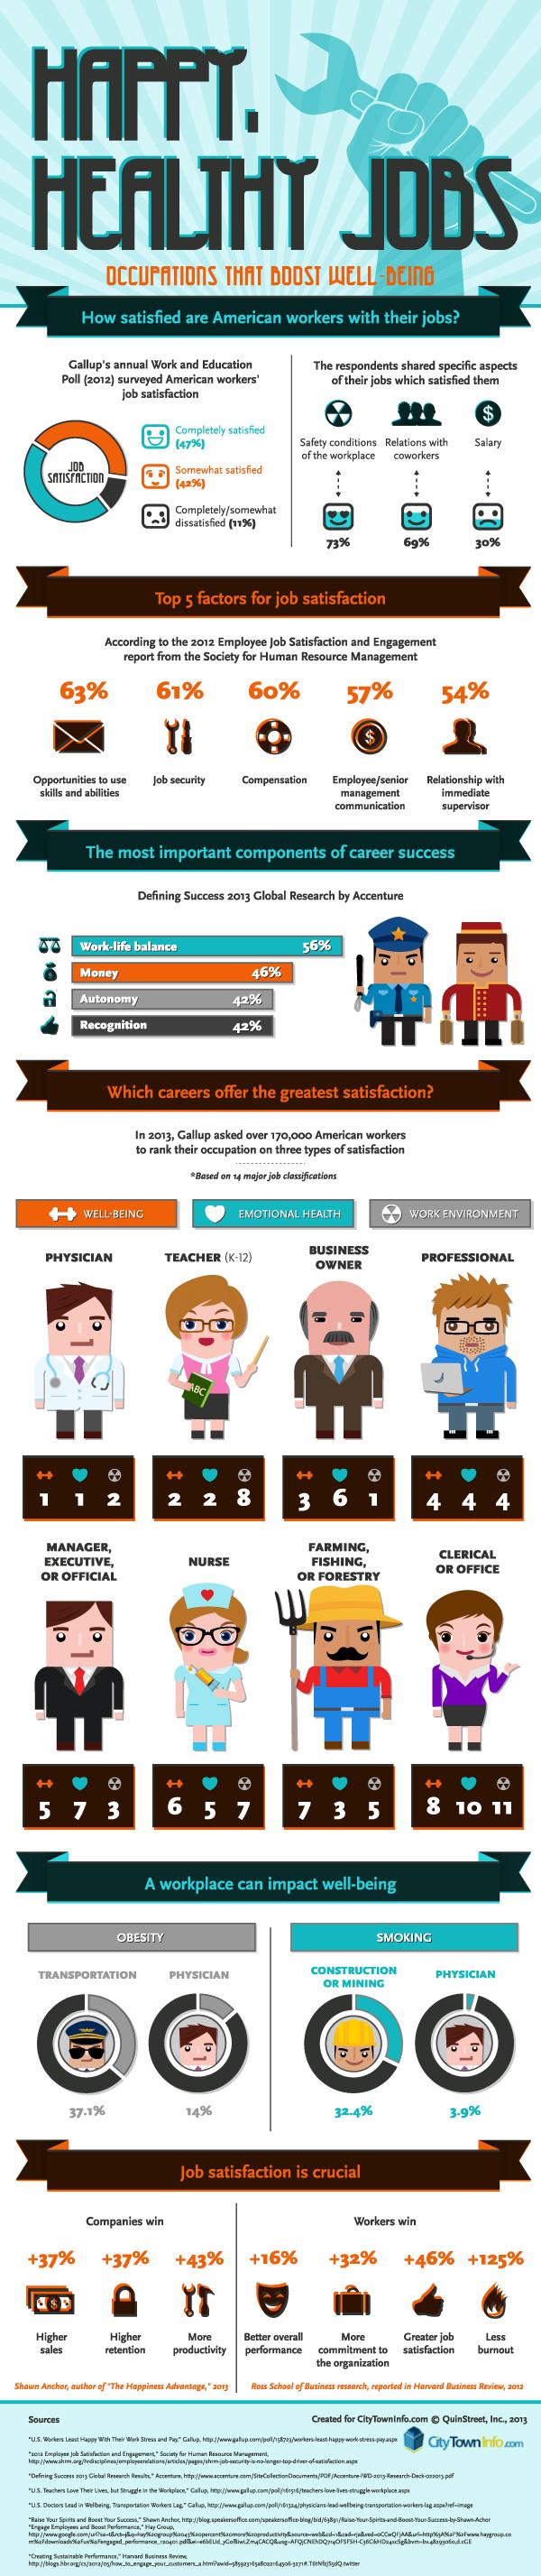 infographic : happy healthy jobs